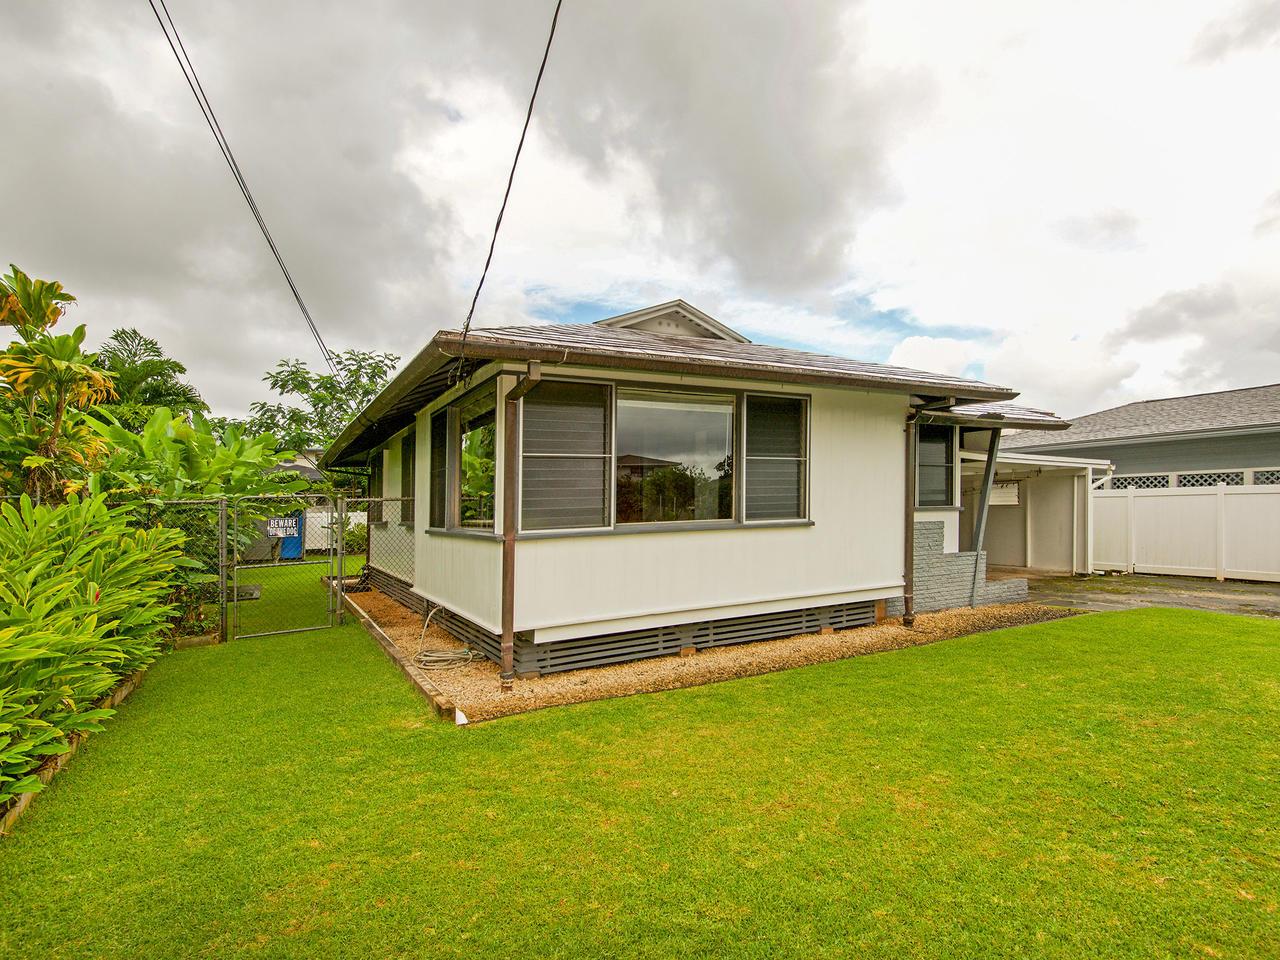 45-525 Koolau View Drive in Beautiful Kaneohe